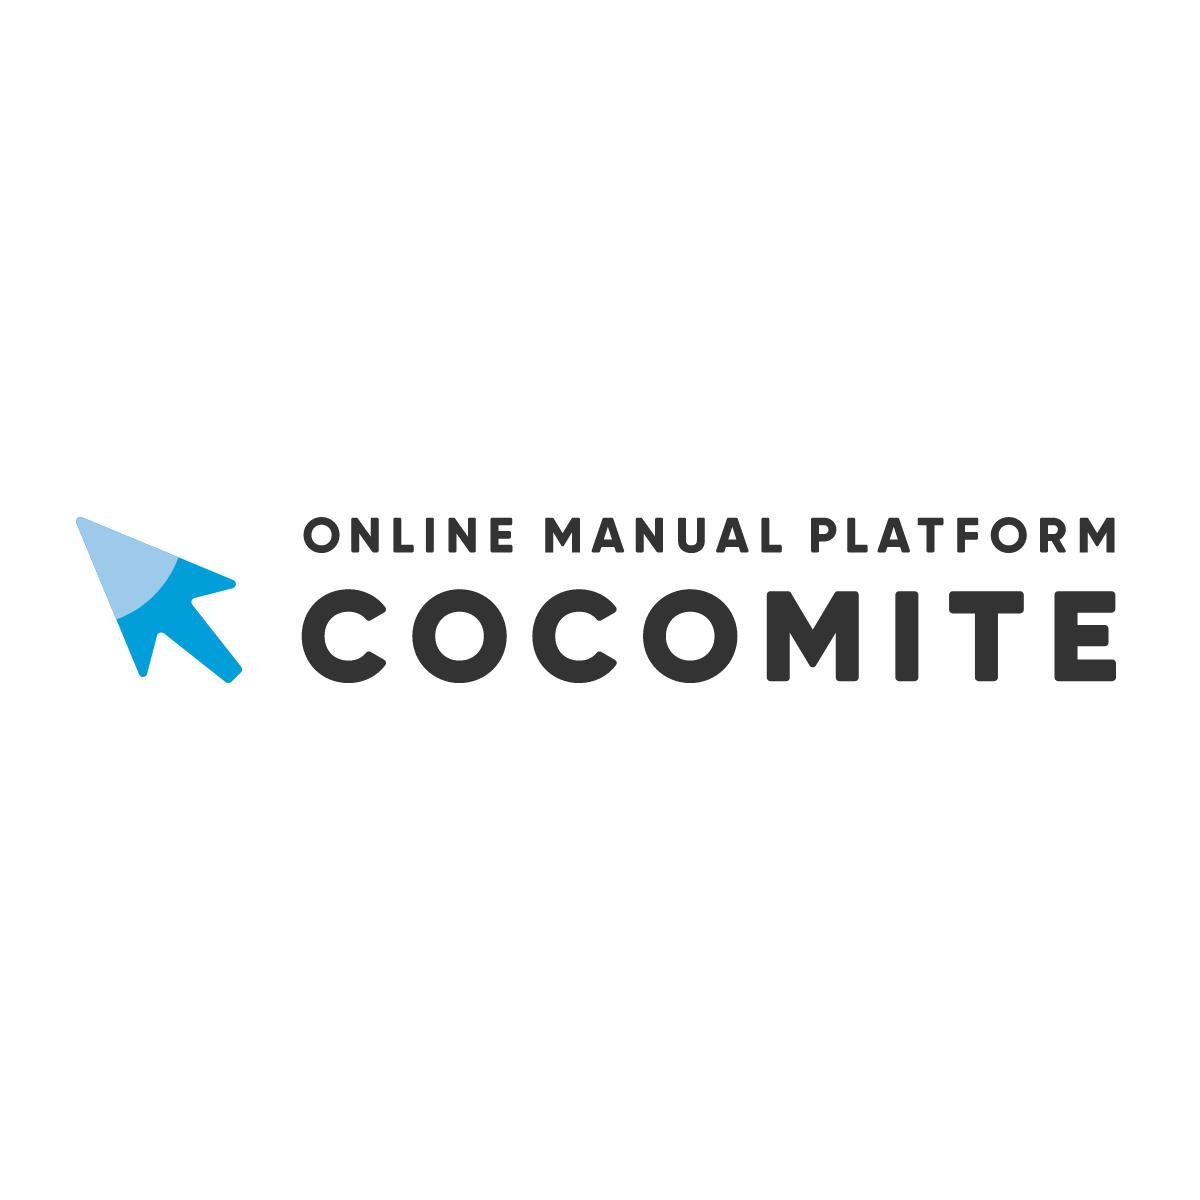 COCOMITE V6.0.0をリリースしました